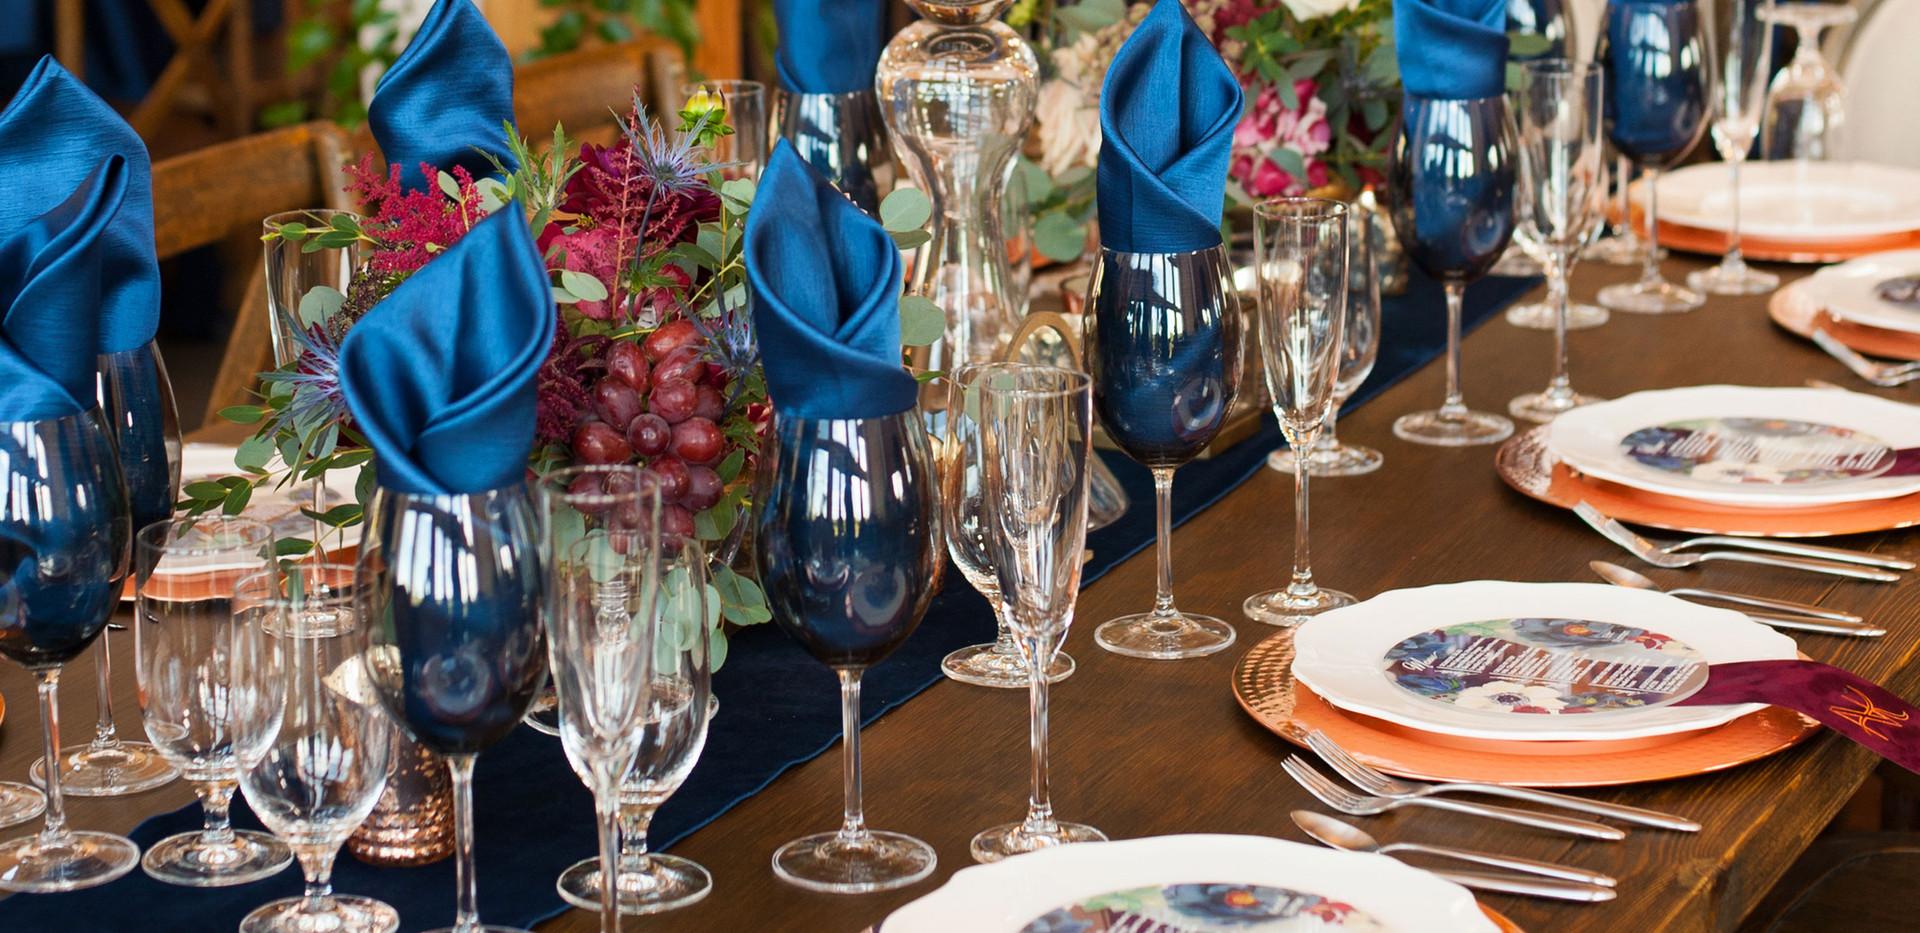 j-char-designs-tablescape-wedding-recept